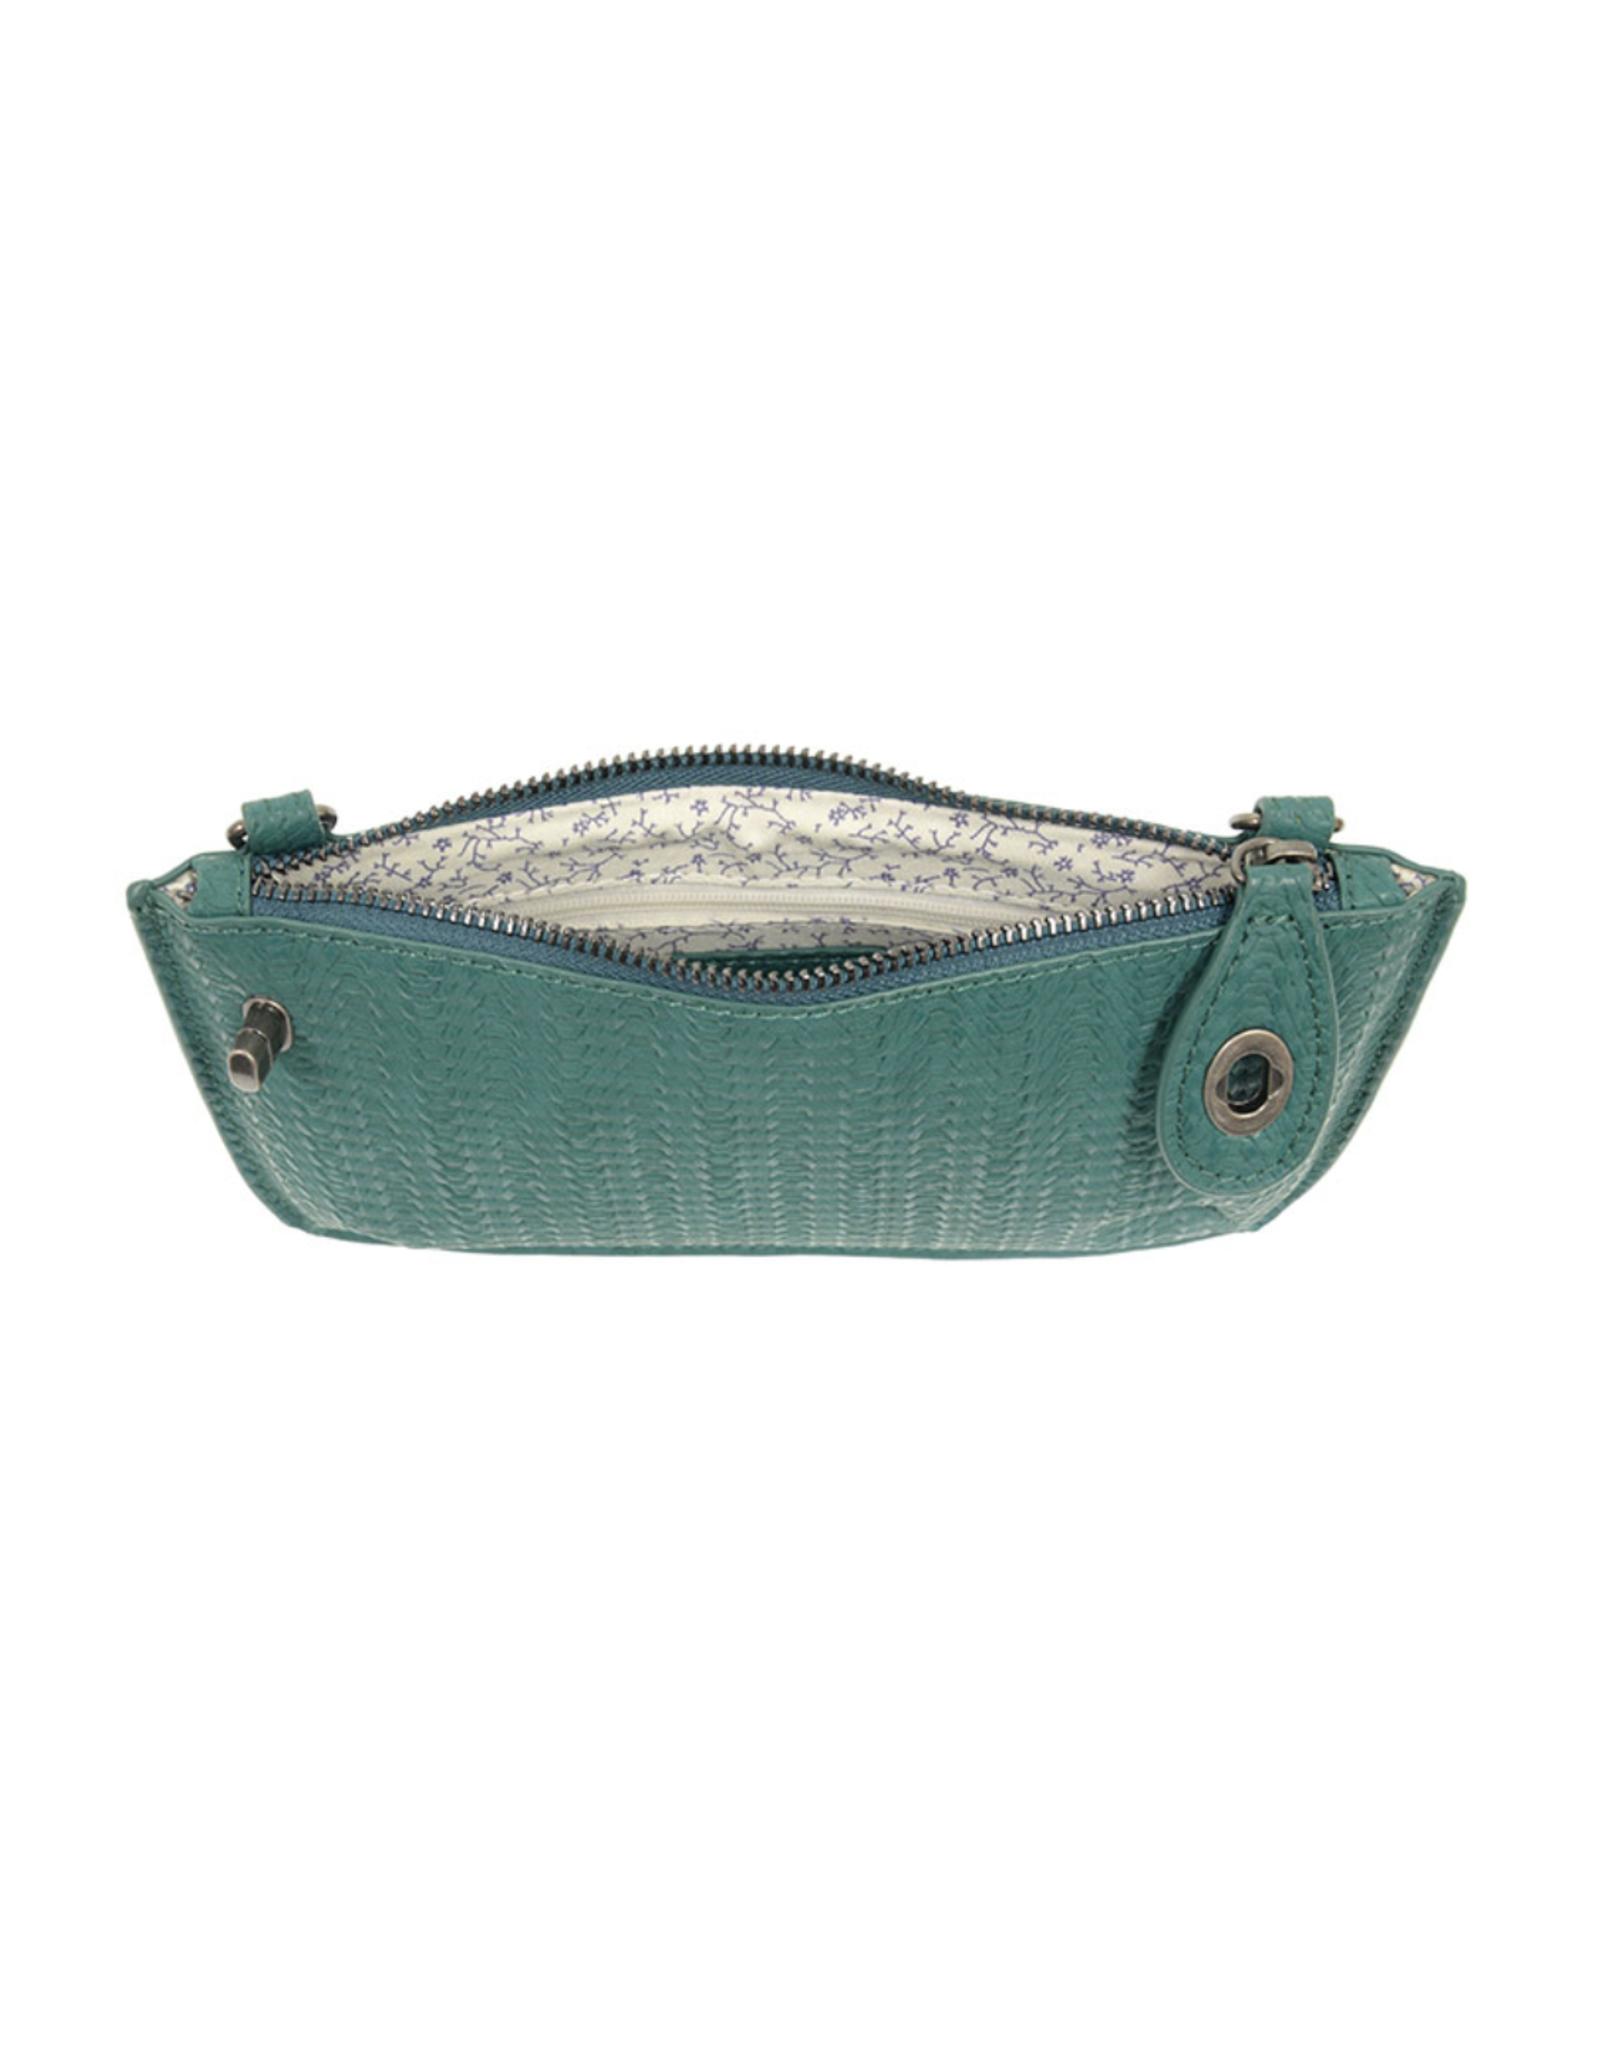 Woven Crossbody Wristlet : Turquoise